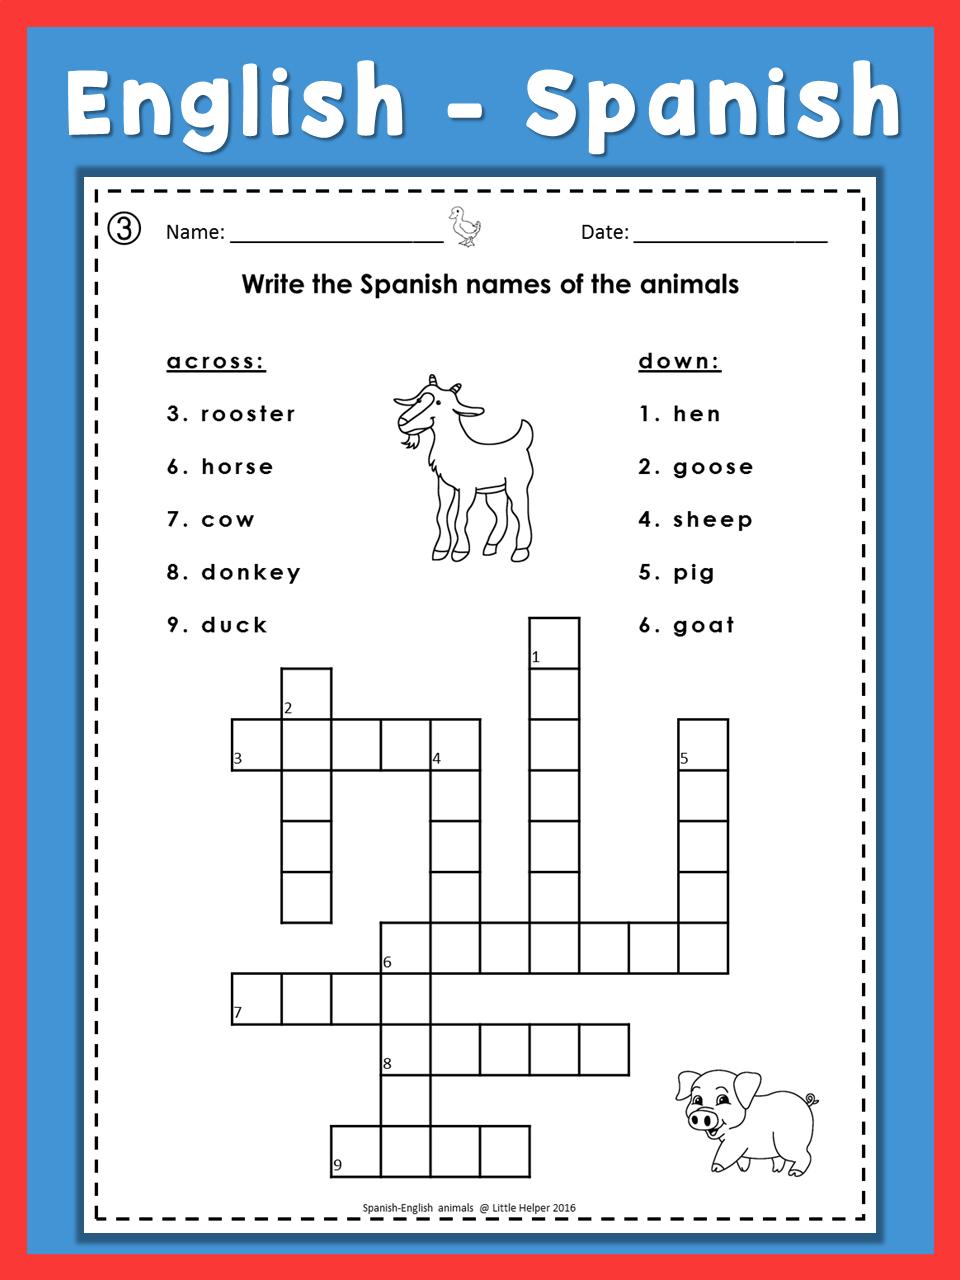 Spanish English Crossword Puzzles Los Animales | Dual Language Super - Printable Spanish Crossword Puzzle